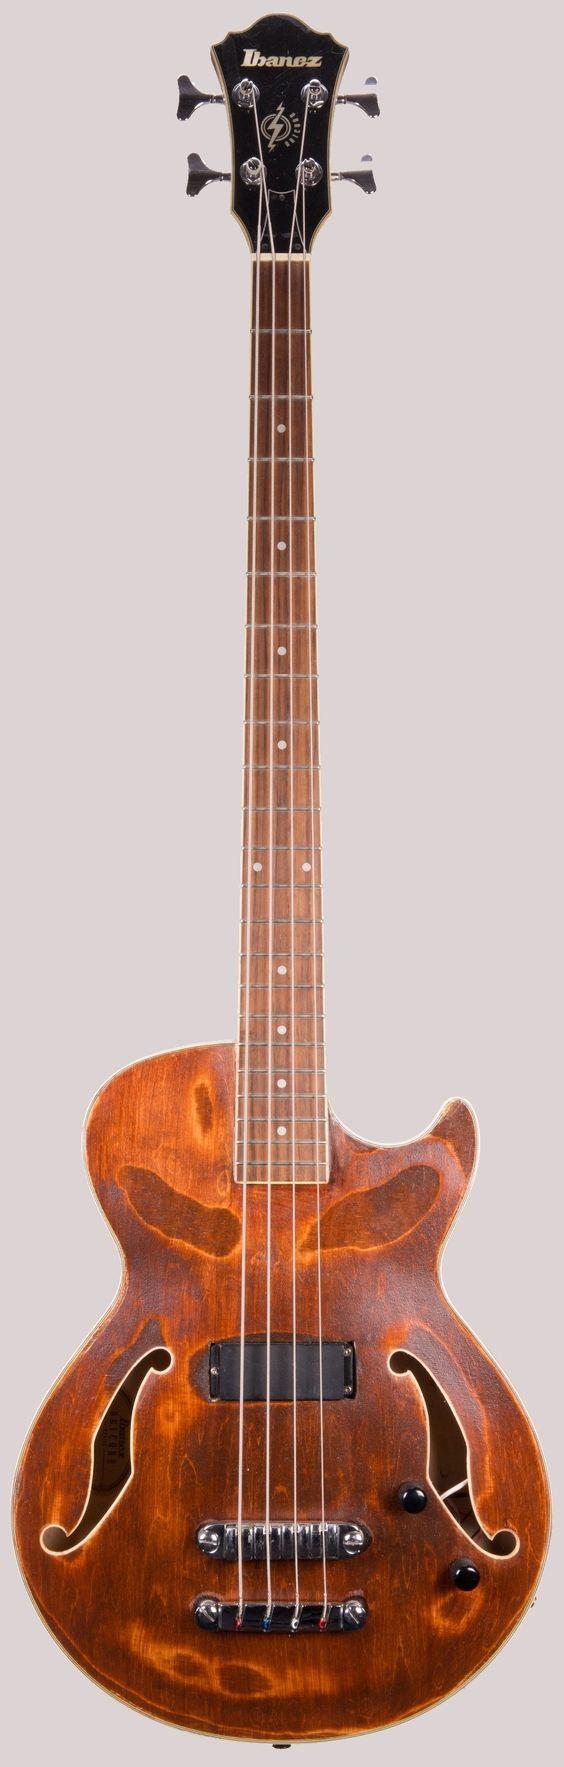 Ibanez Artcore AGB140 semi hollow bass guitar ukulele corner